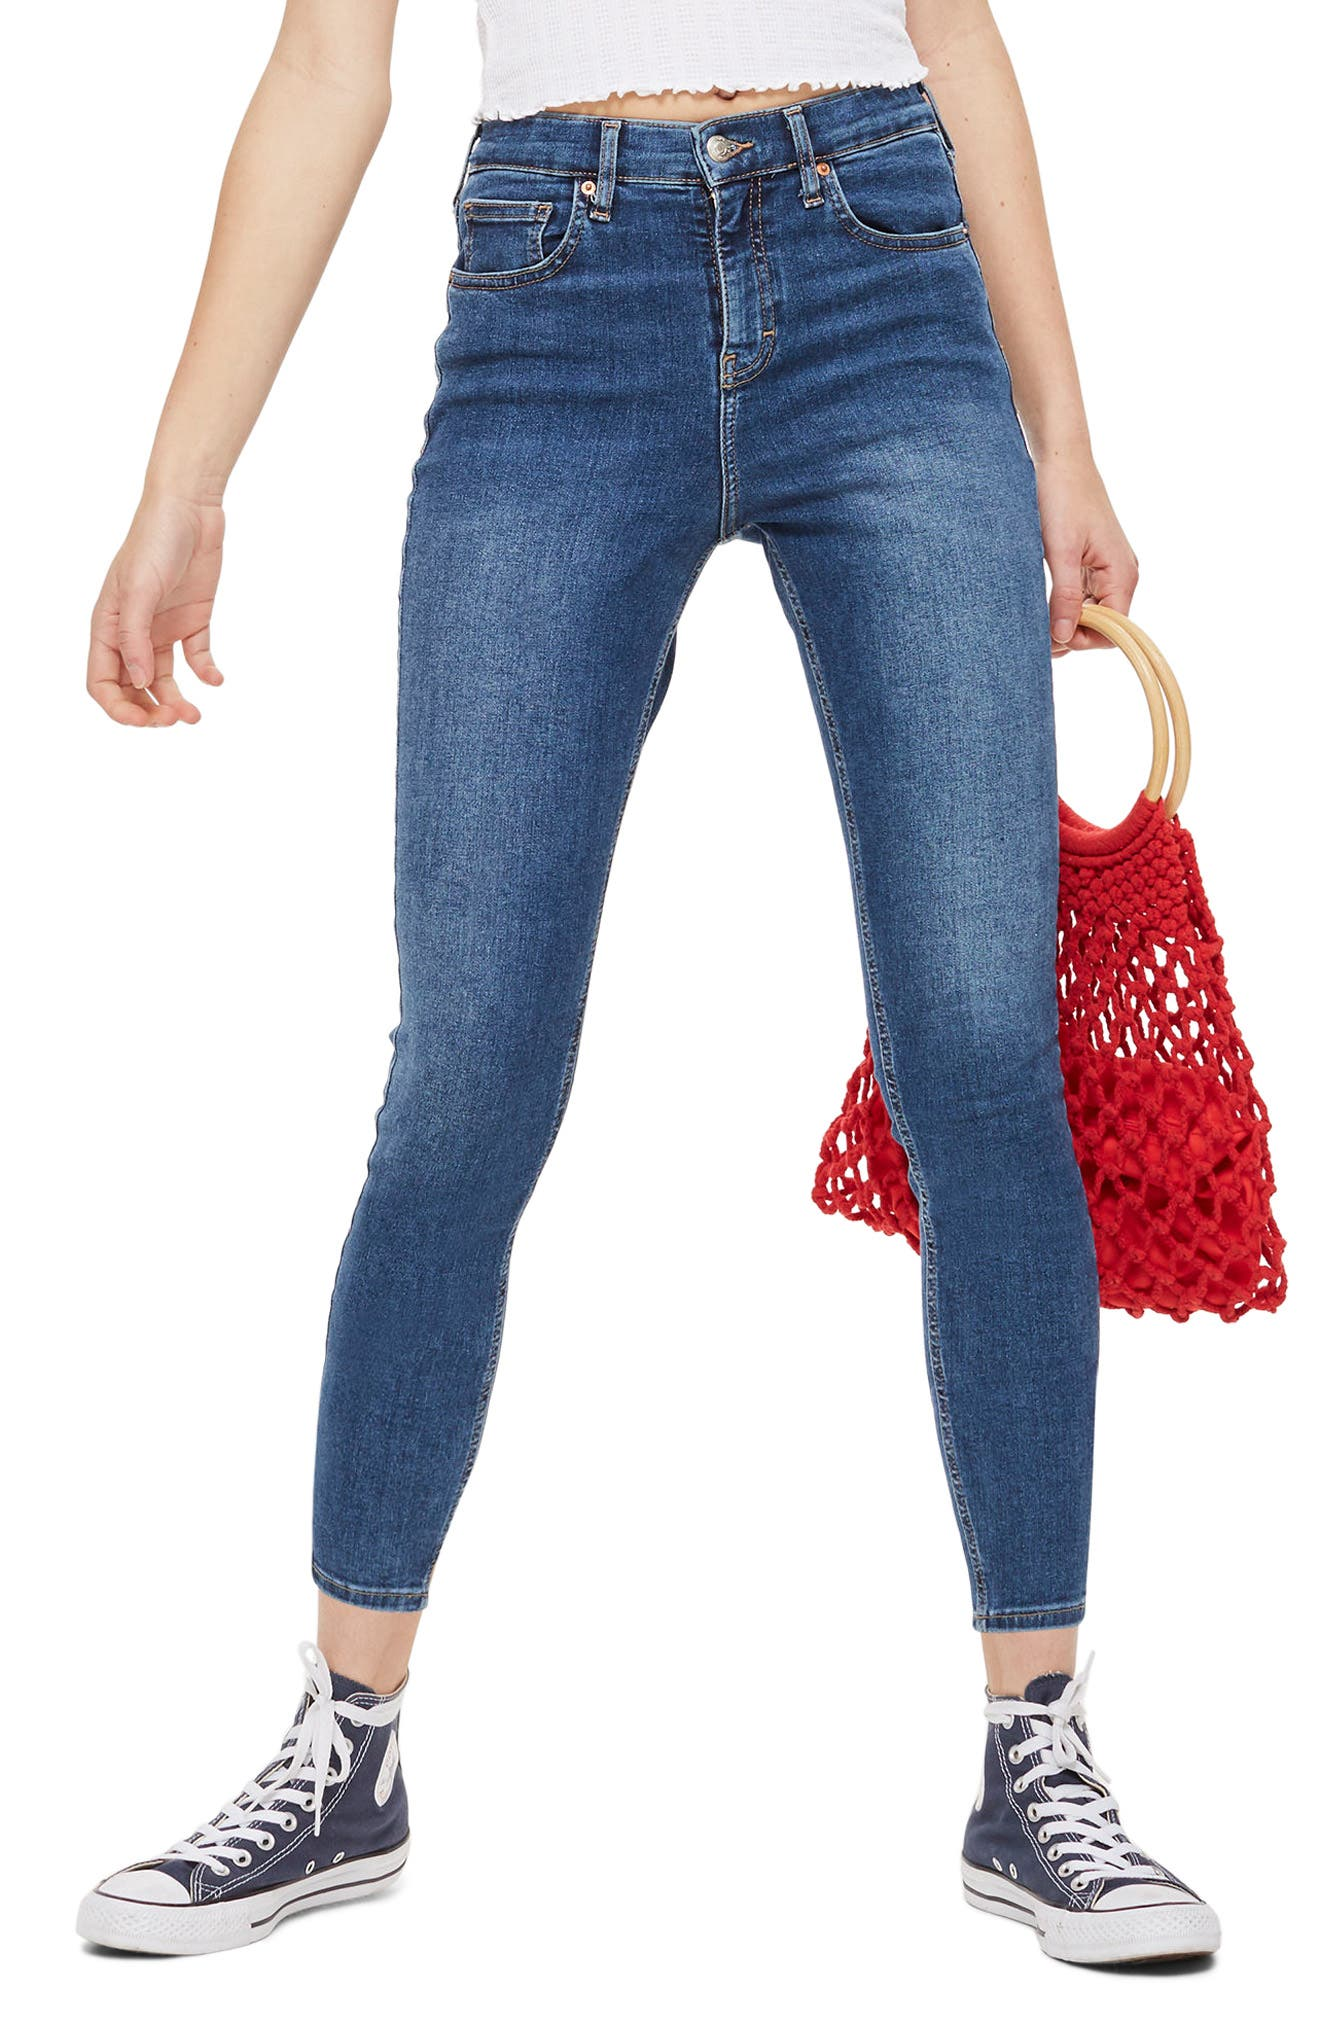 Jamie Petite Jeans,                             Main thumbnail 1, color,                             Indigo